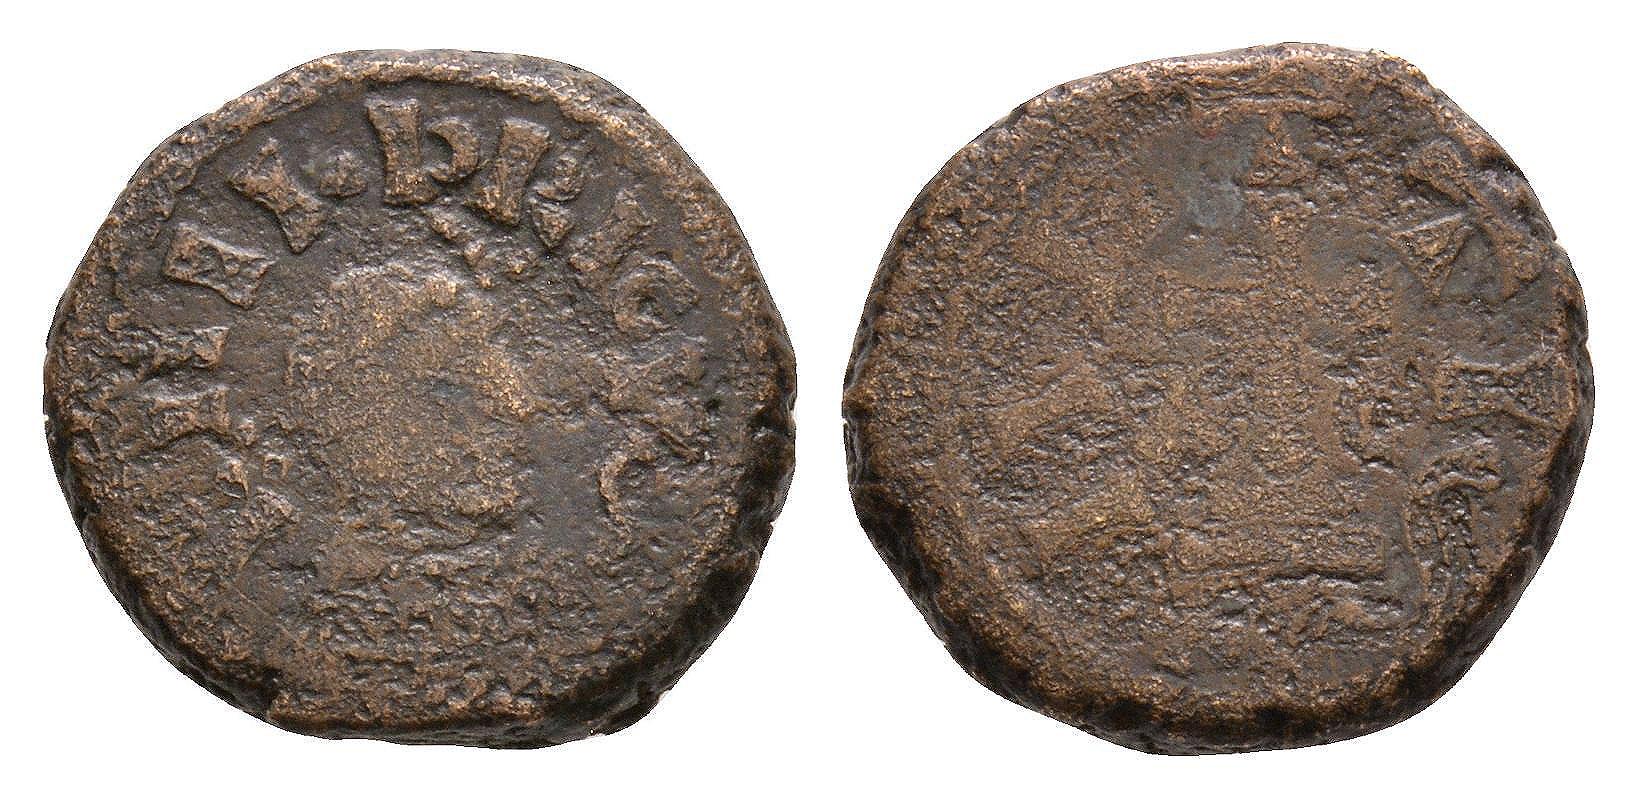 World Coins - Merovingian - Childeric I - Metz(?) - Uncertain Bronze Piece